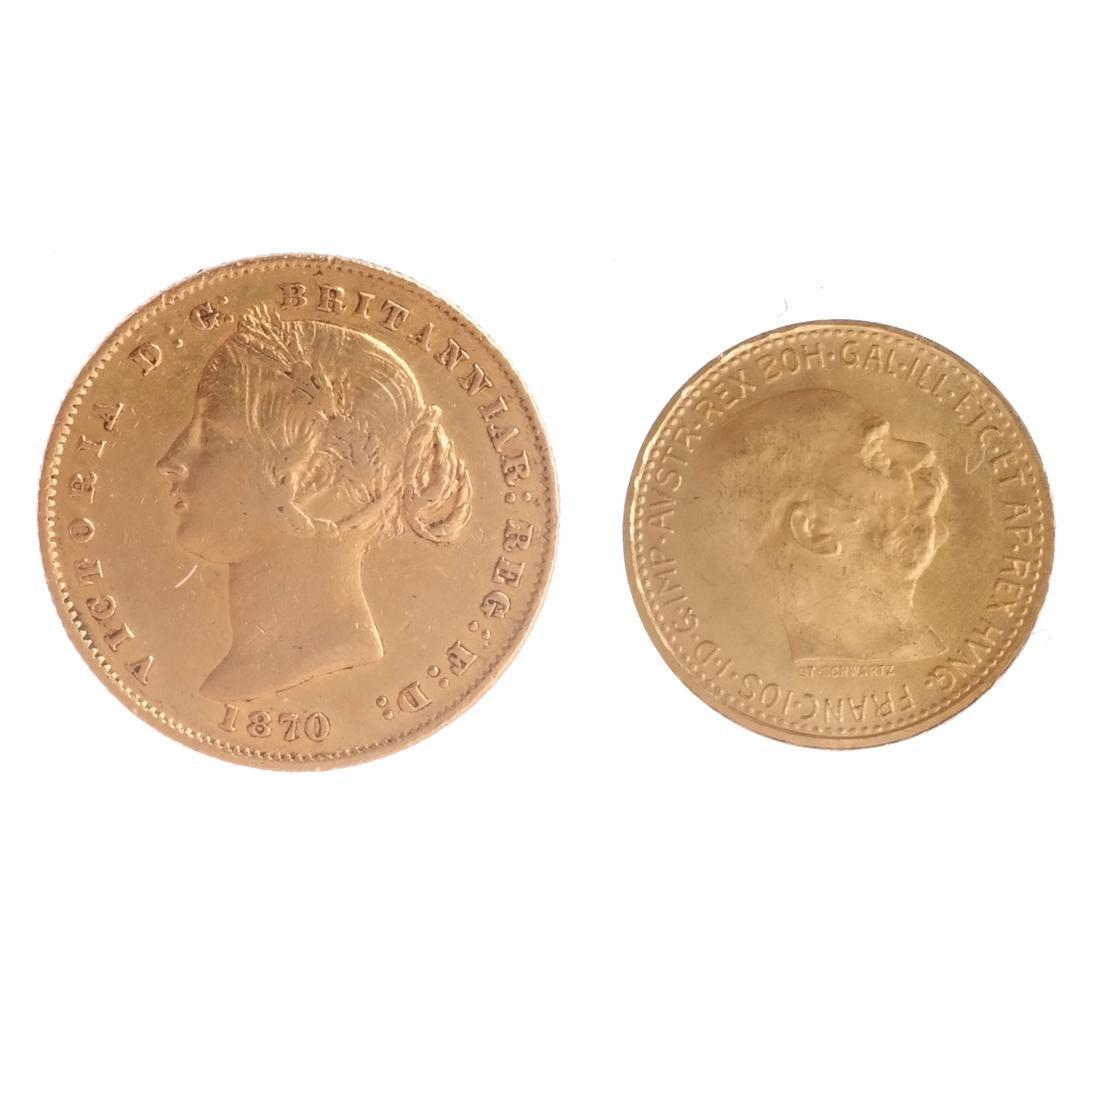 2 Gold, 10 Corona Austria, 1 Australia